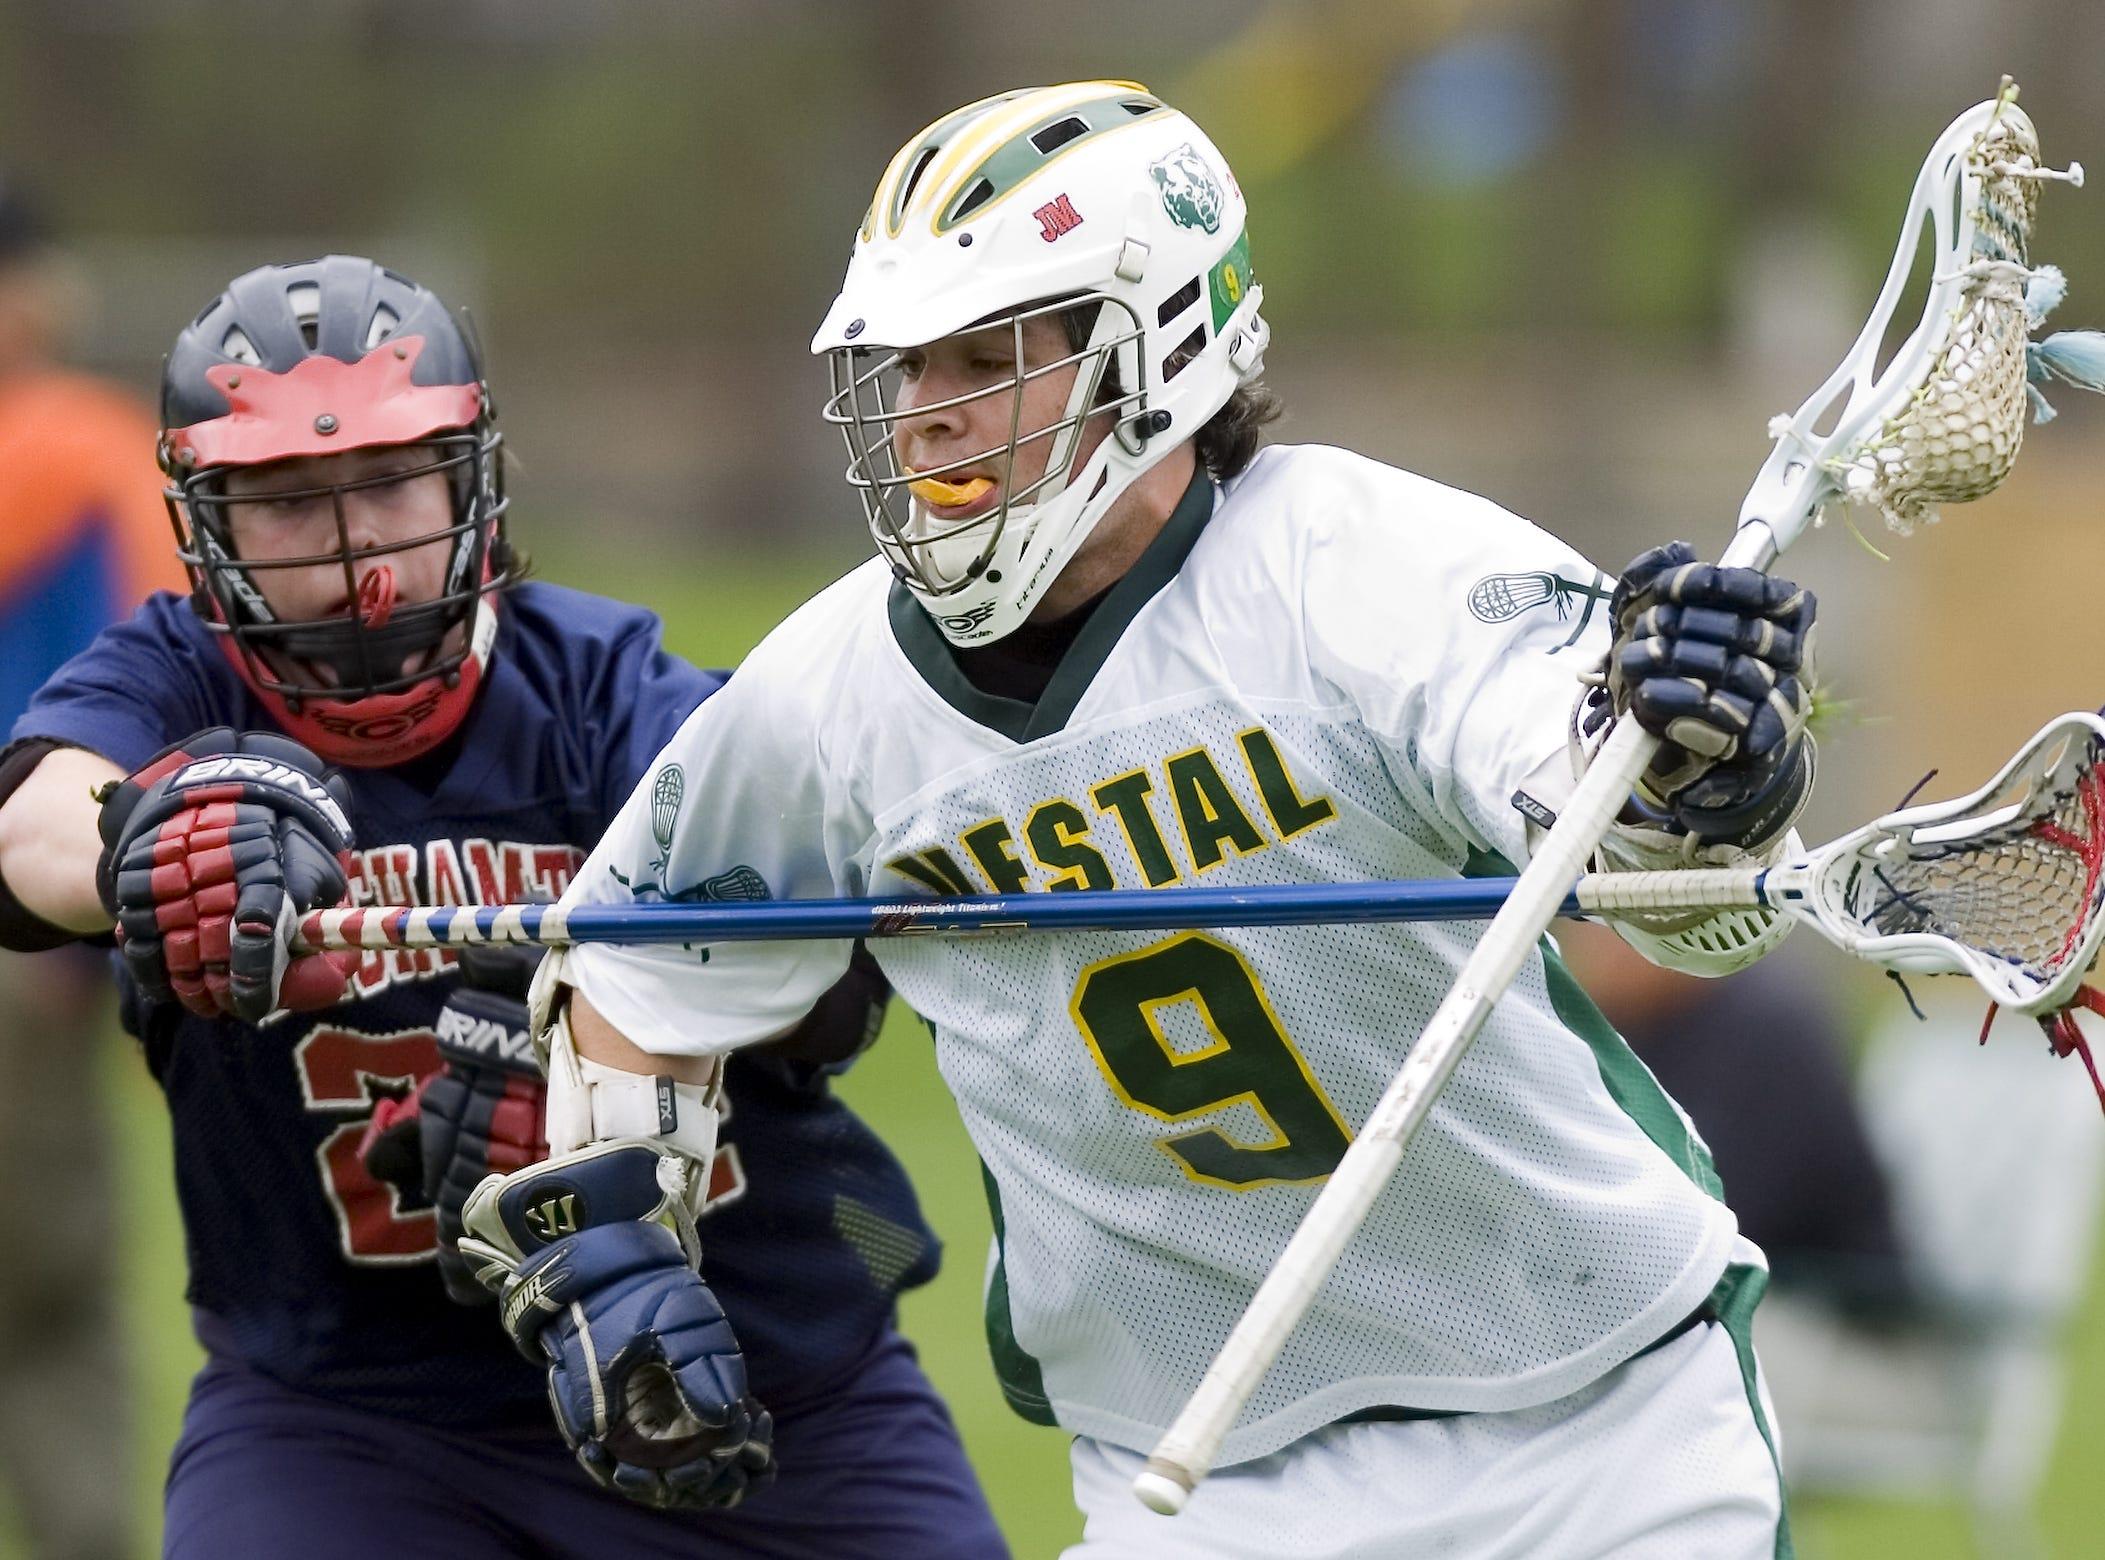 2007: Vestal High School's Travis Harrington, right, works past Binghamton High School's Pat Joyce in the first period of the Tuesday lacrosse game in Vestal.